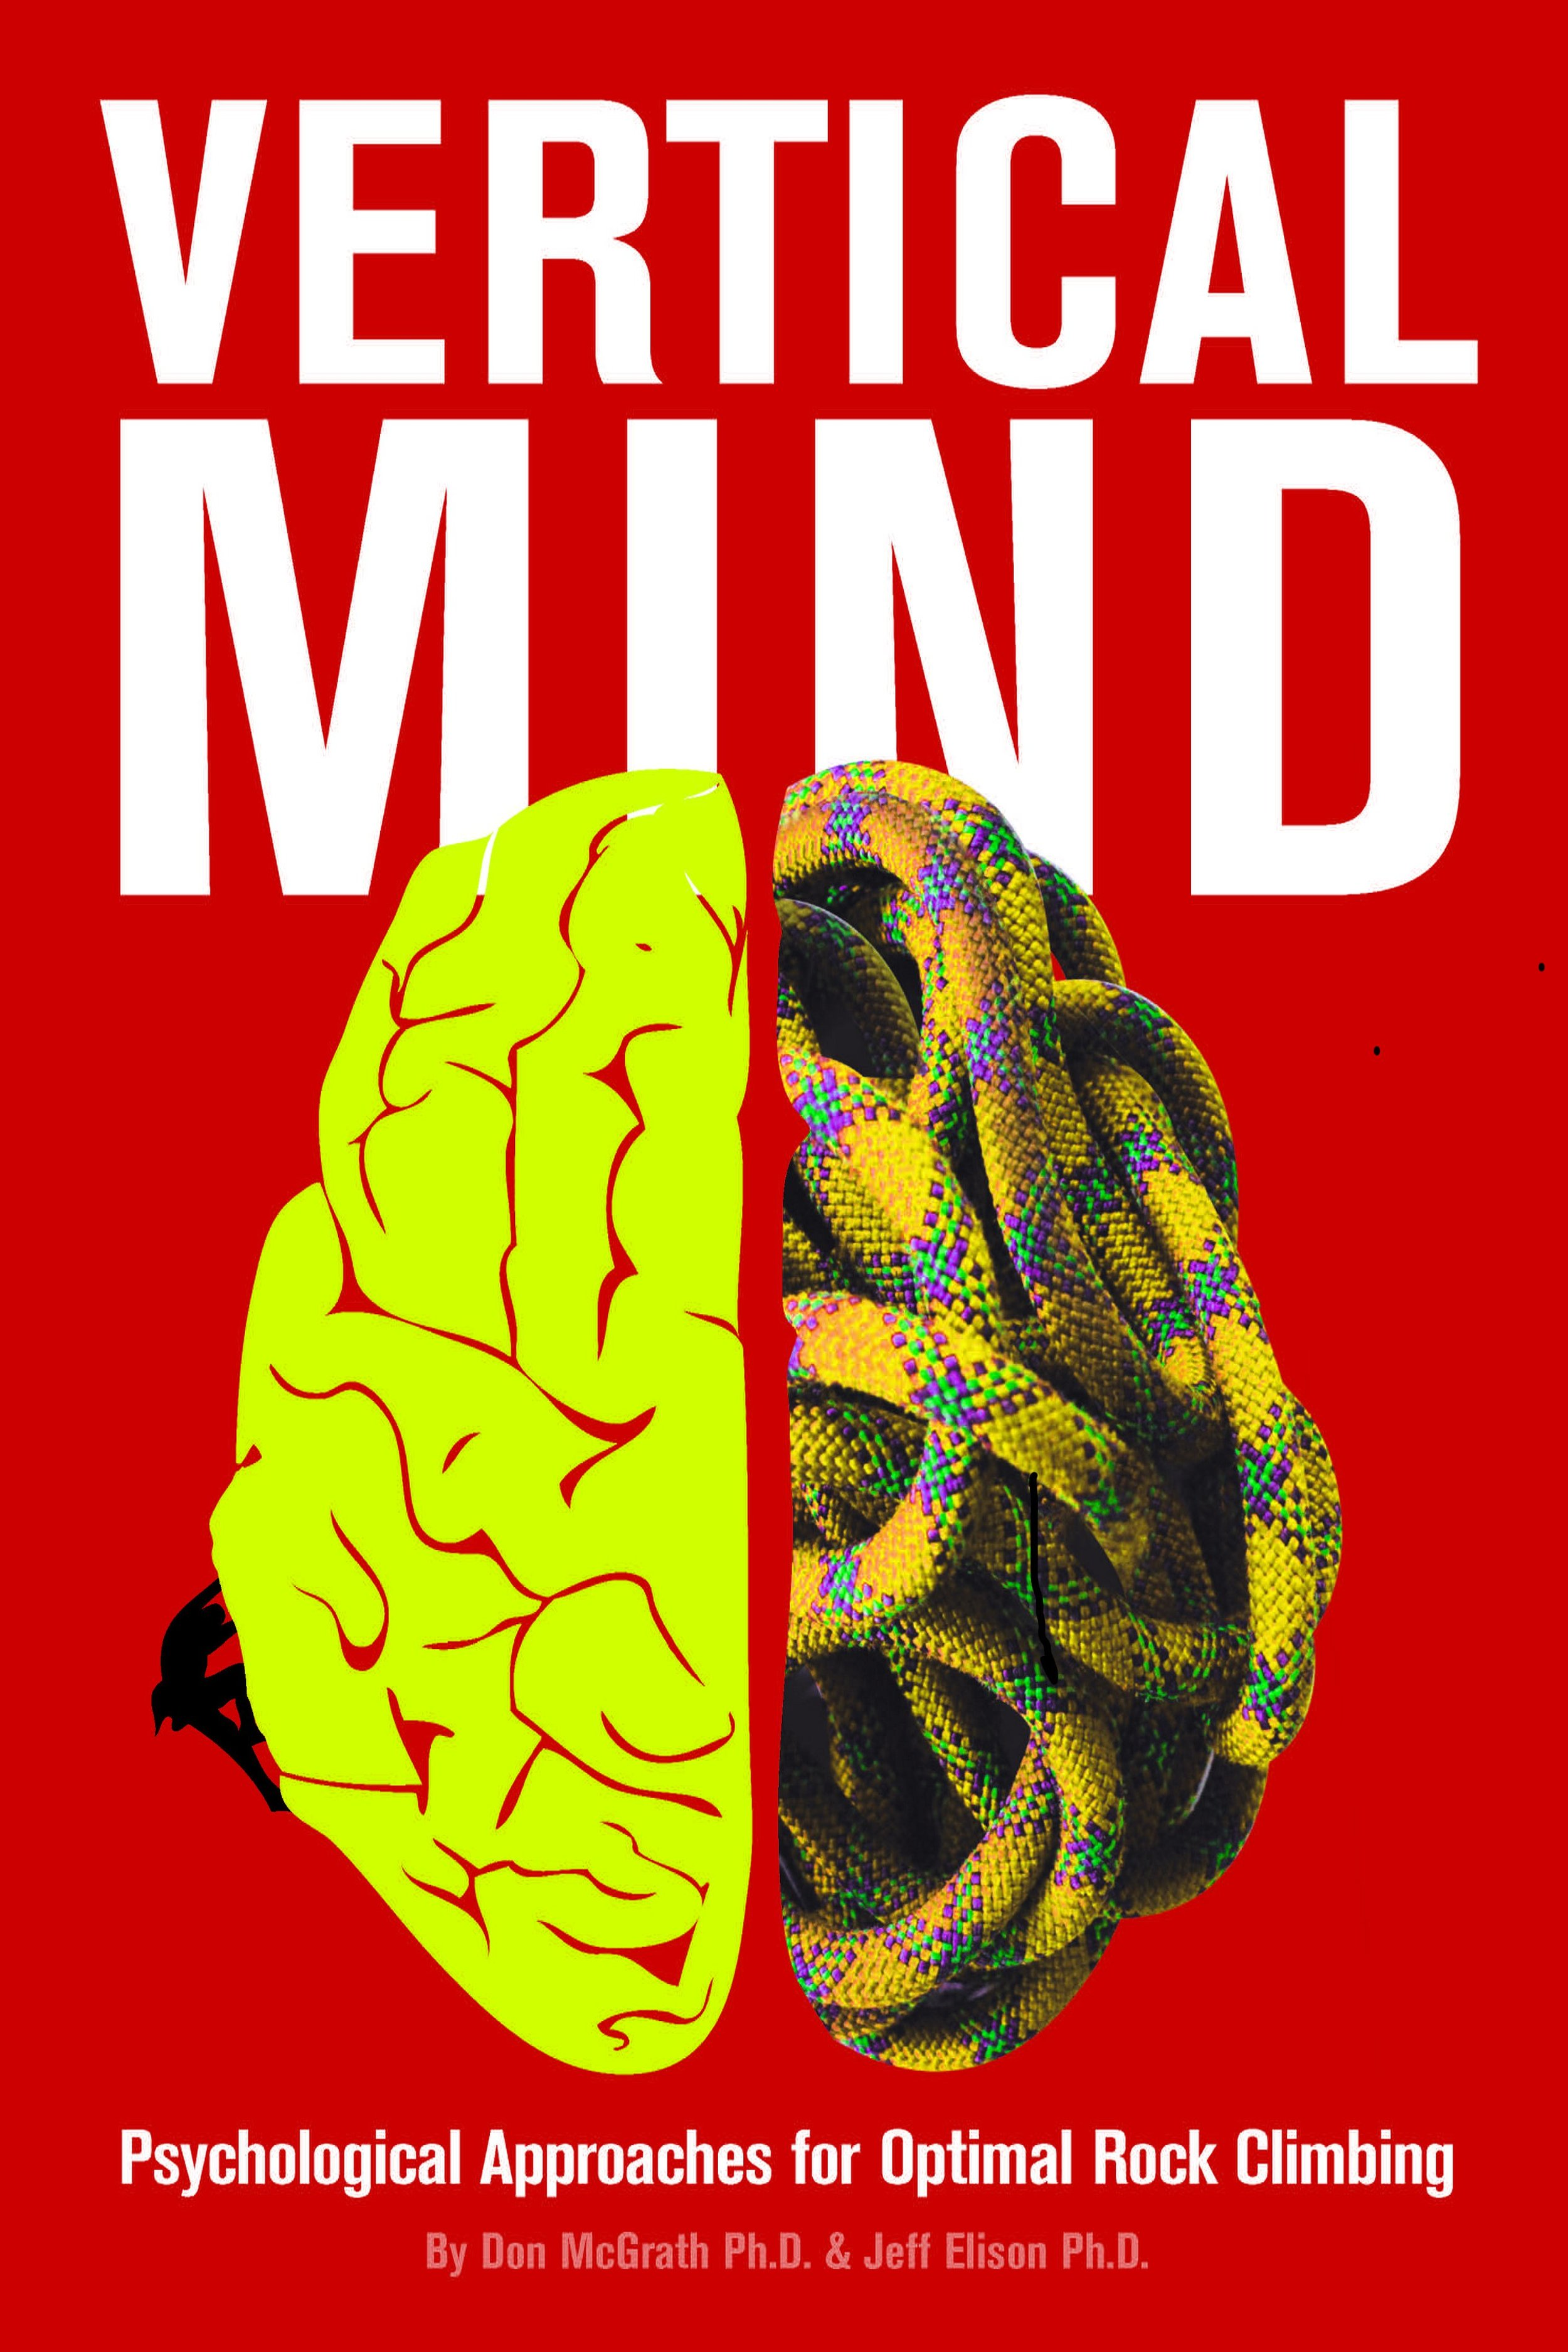 Vertical Mind cover -4.jpg